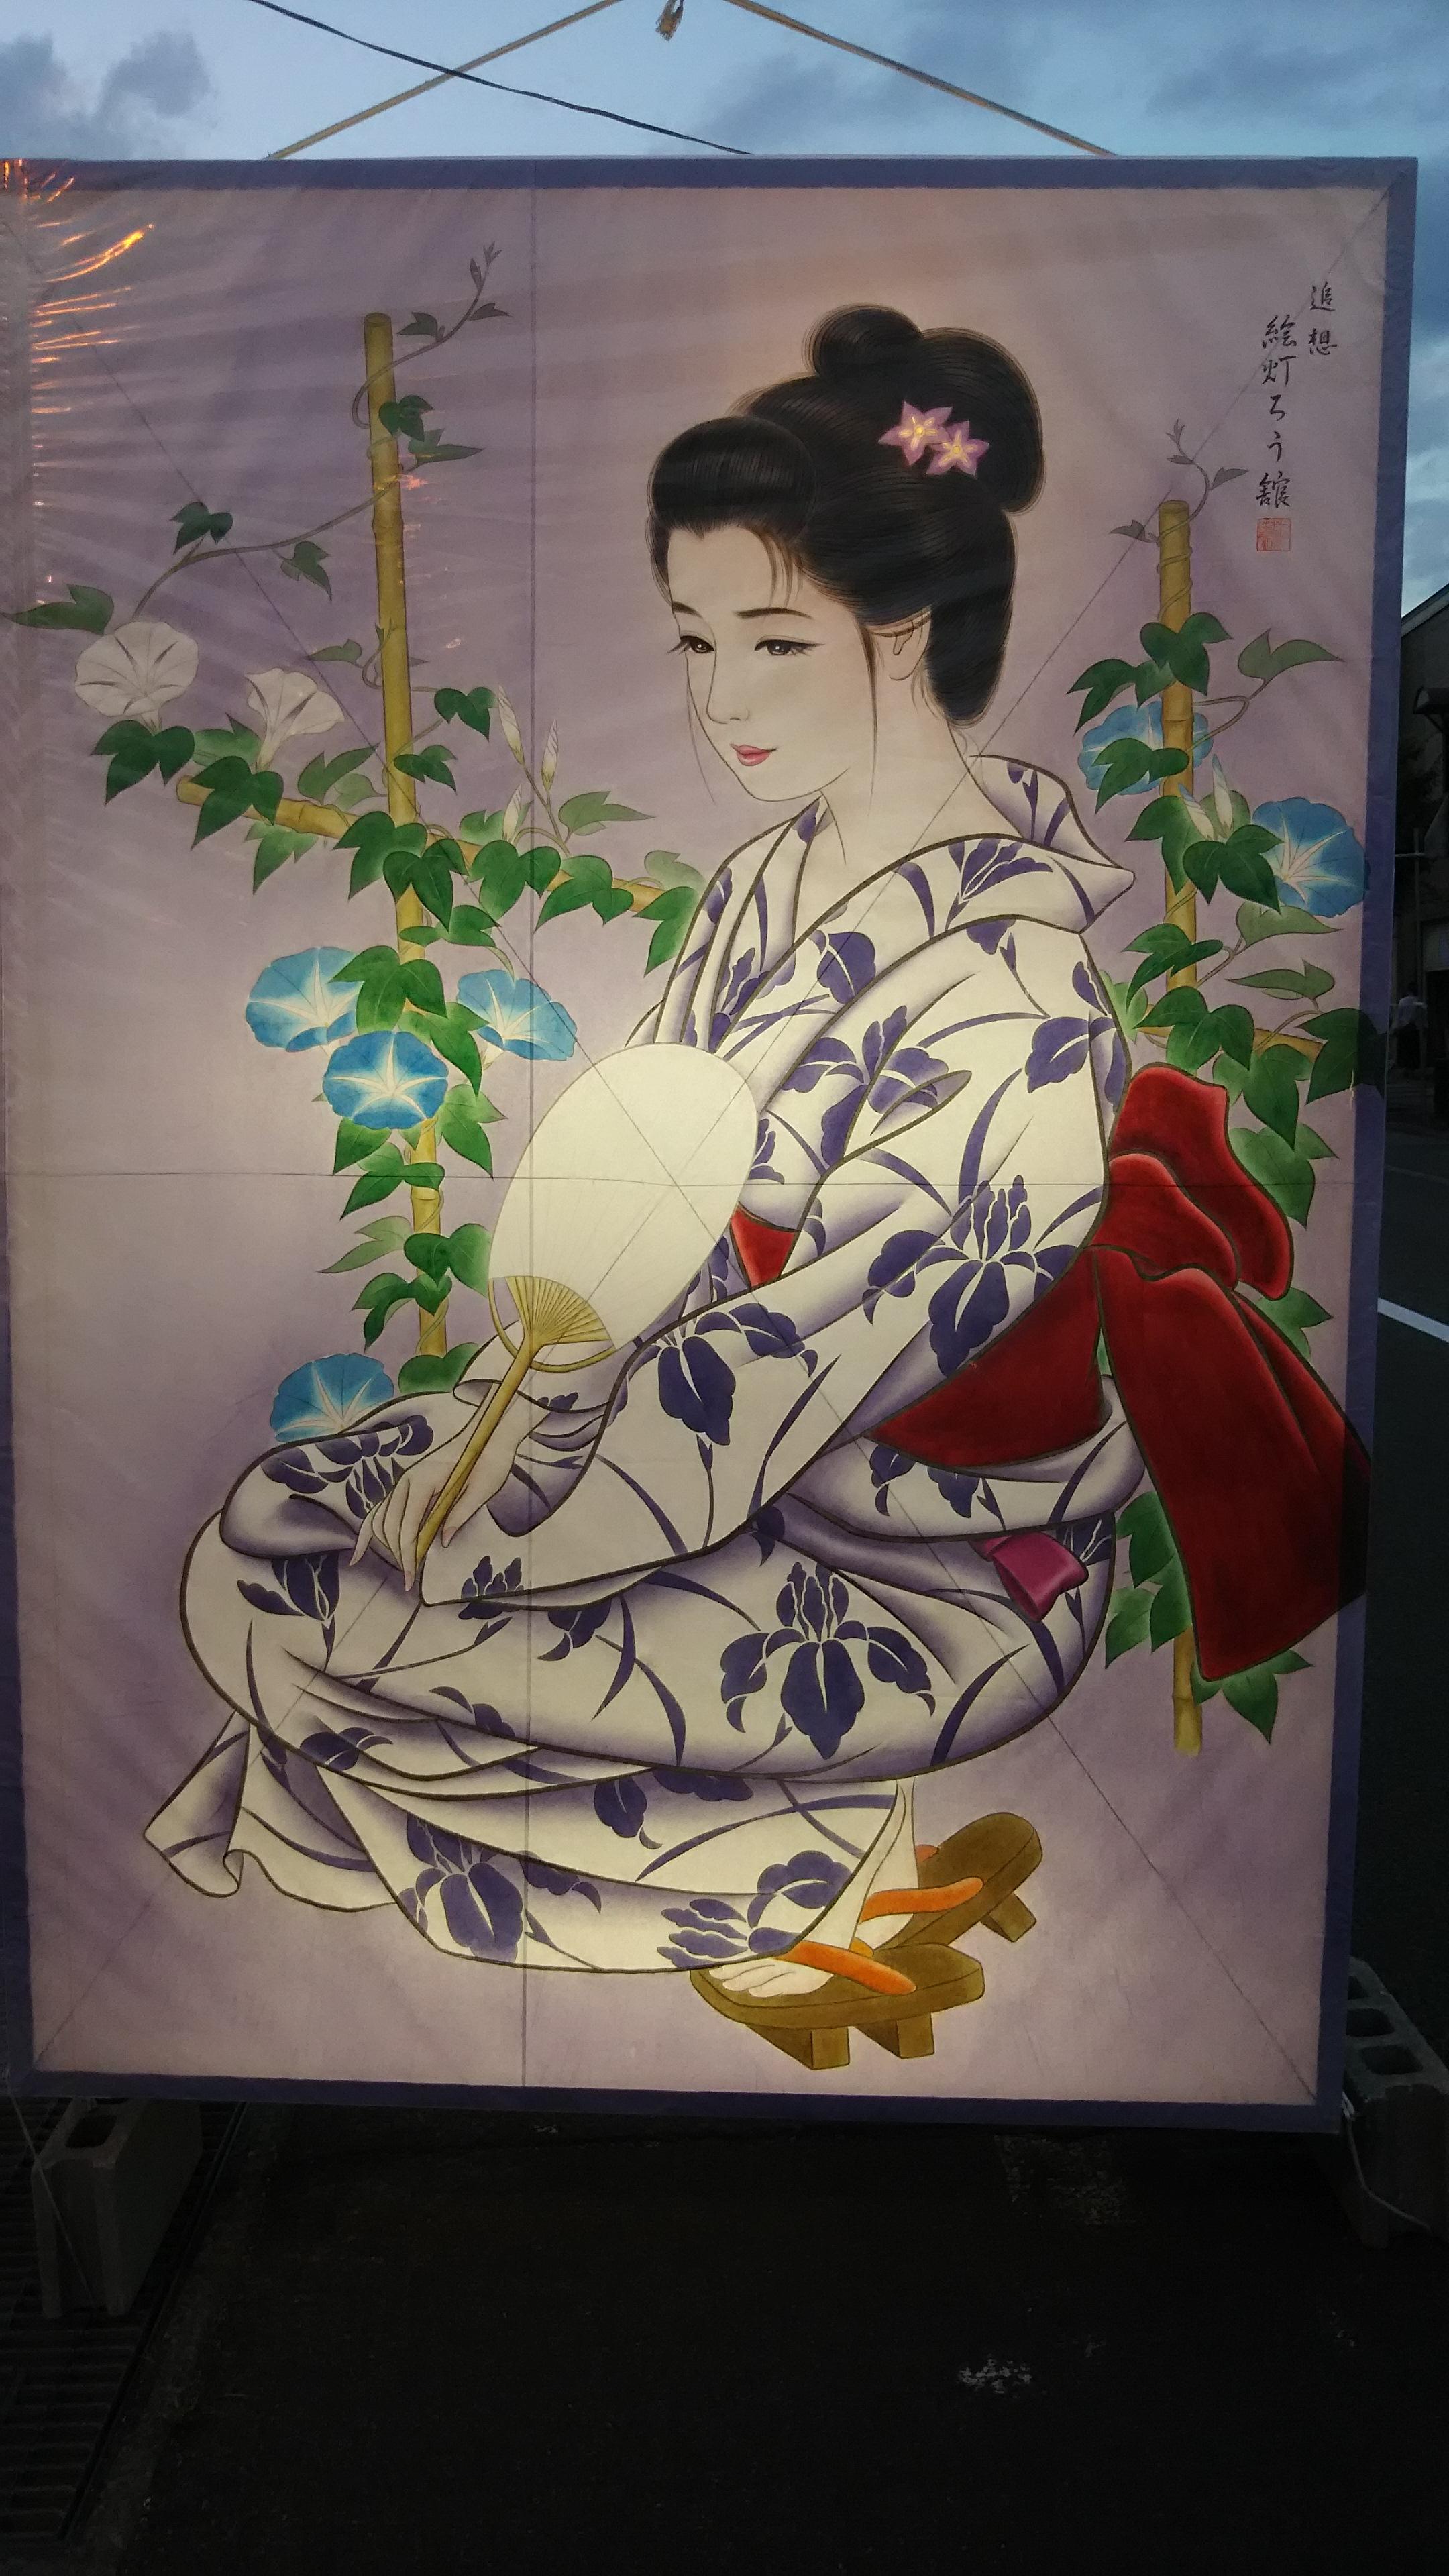 http://www.fukukomachi.com/blog/photo/DSC_0155.JPG